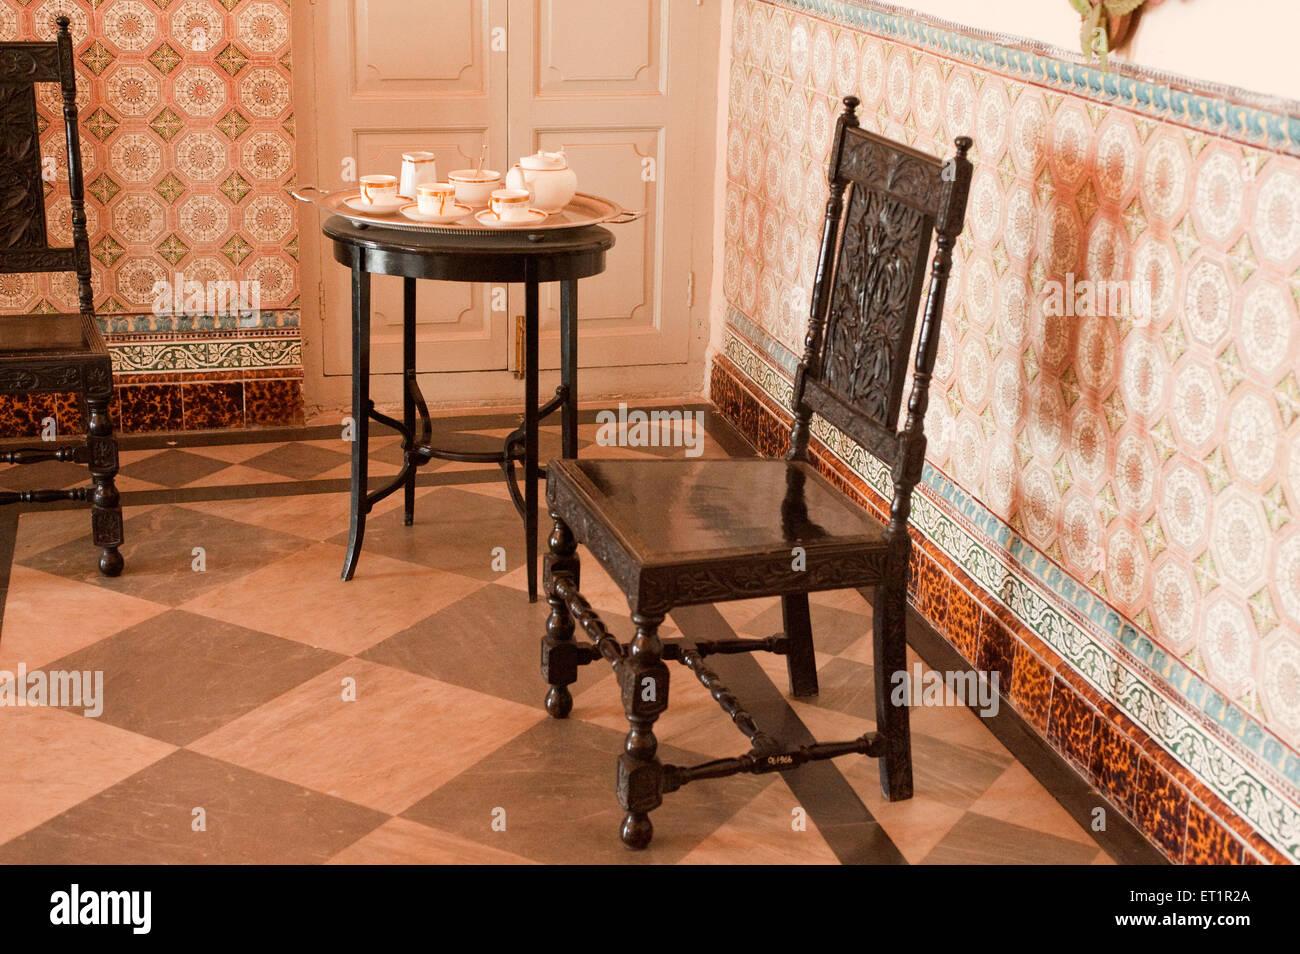 Dining room in scindia museum in jaivilas palace ; Gwalior ; Madhya Pradesh ; India - Stock Image